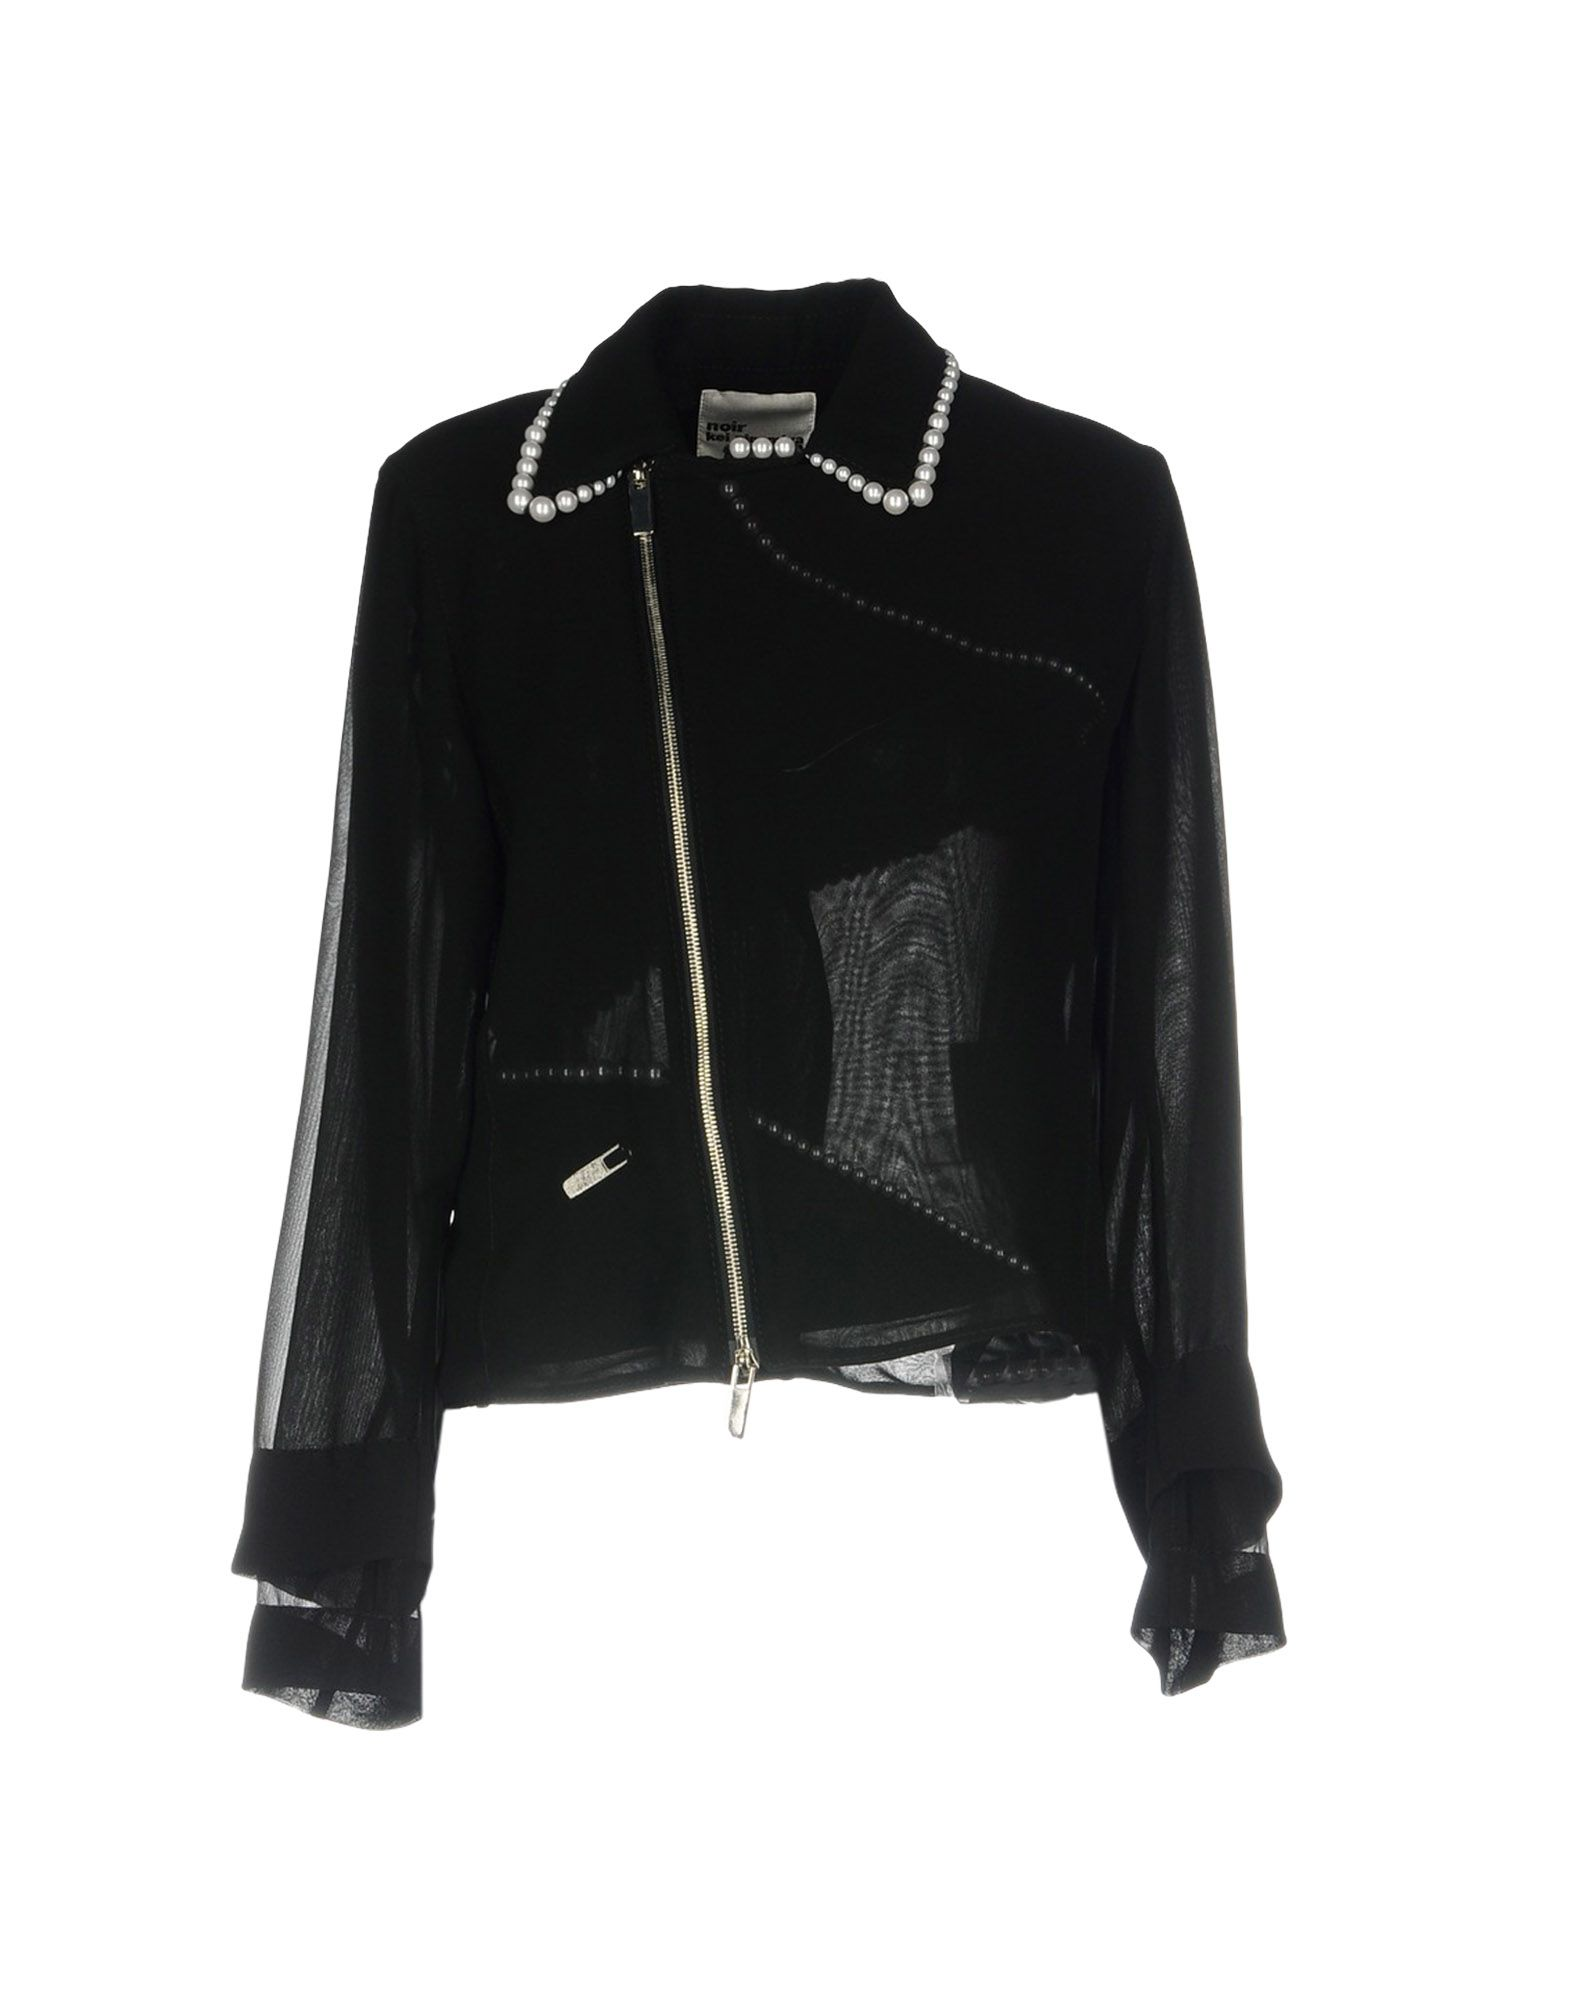 NOIR KEI NINOMIYA Blazers in Black